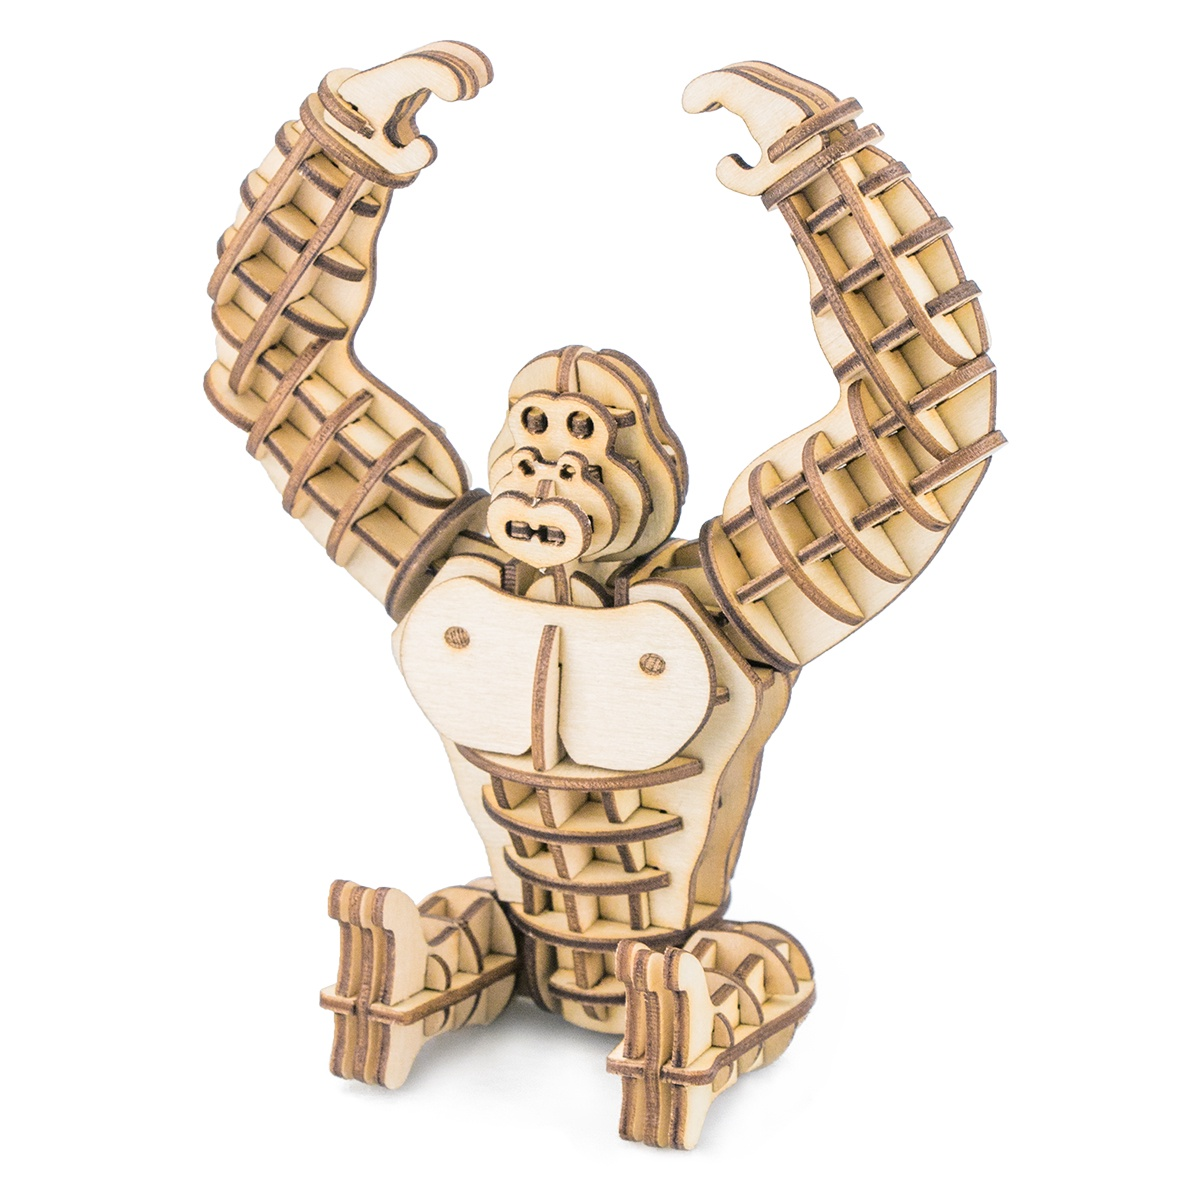 3D Пазл Robotime Деревянные 3D пазлы Gorilla цена